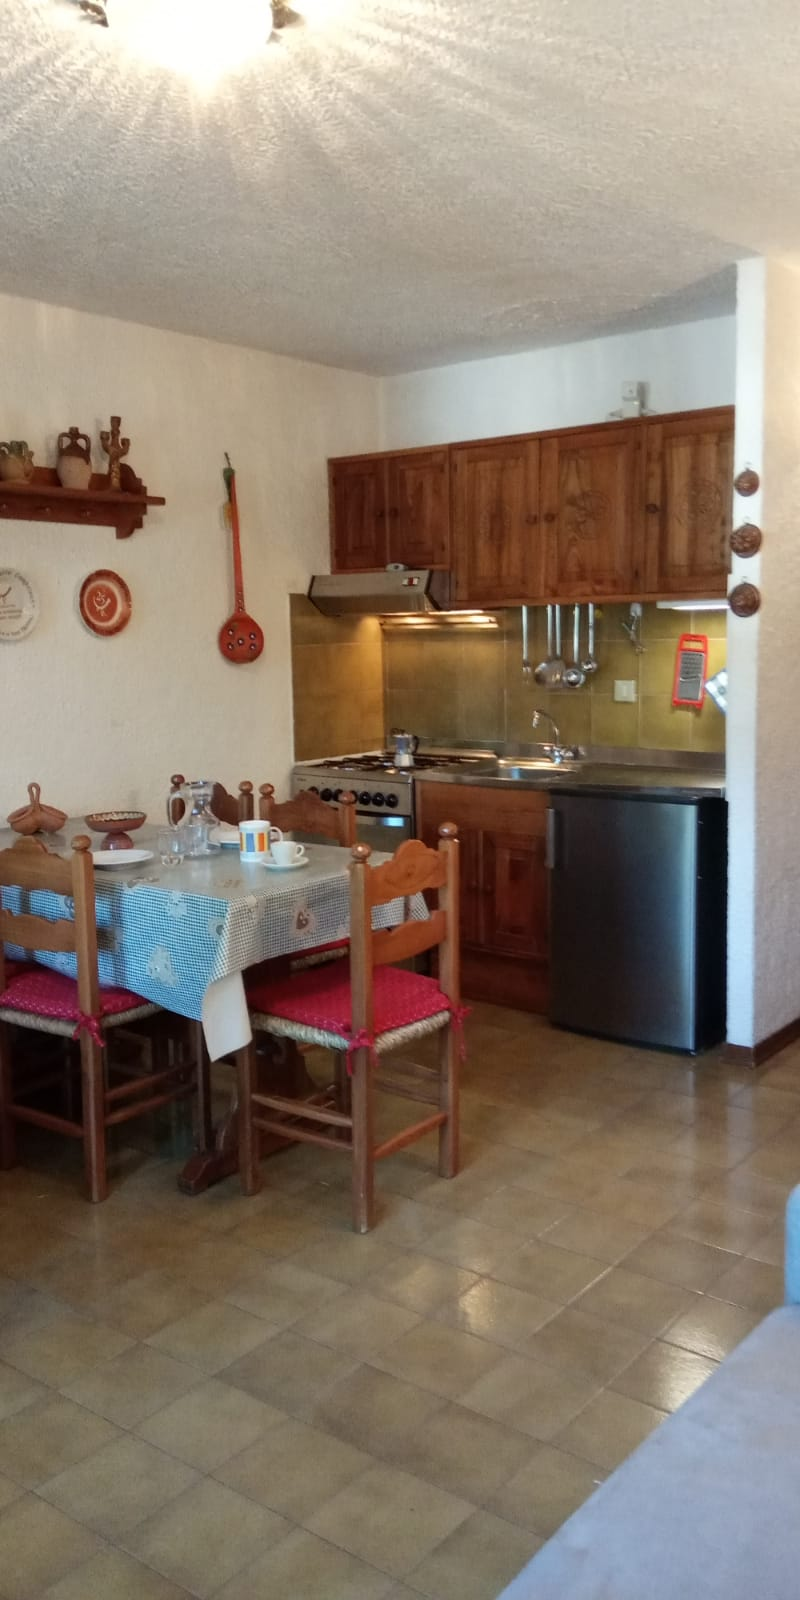 Comodo Bilocale A Folgarida Con Balcone Appartements A Louer A Folgarida Trentino Alto Adige Italie